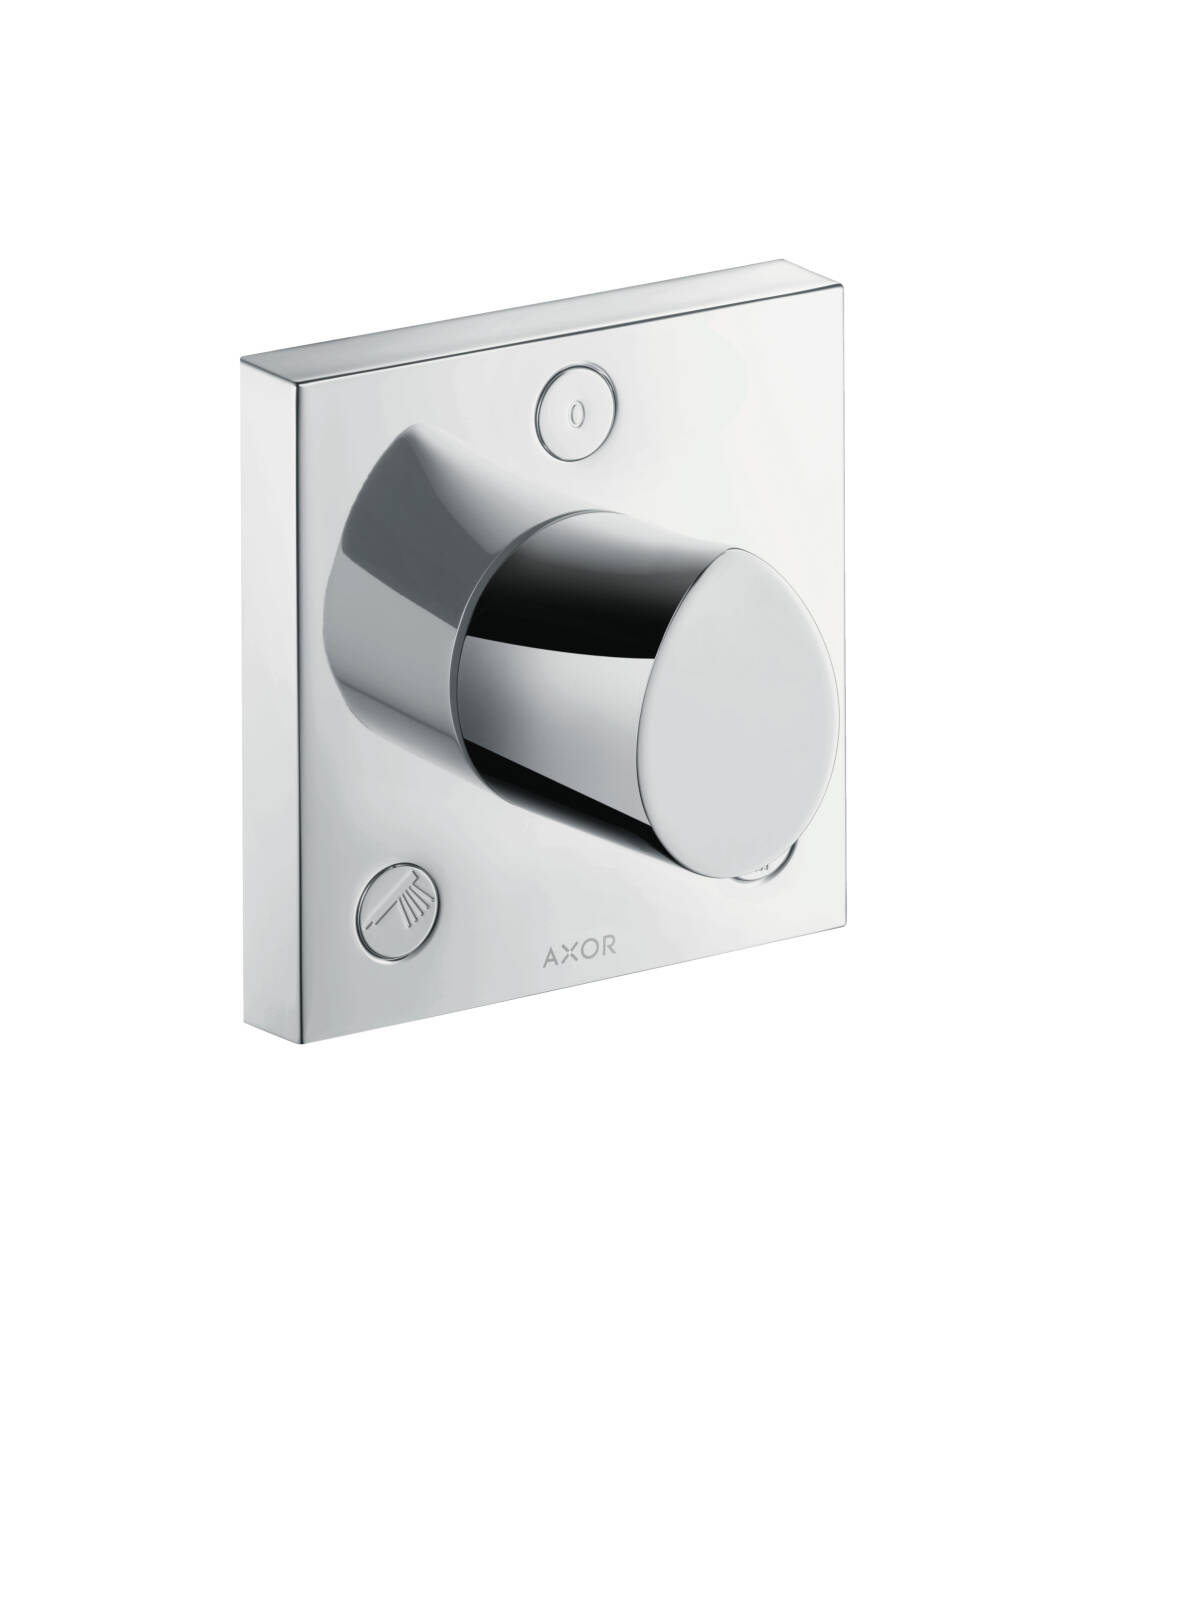 Shut-off/ diverter valve Trio/ Quattro 120/120 for concealed installation, Chrome, 12731000